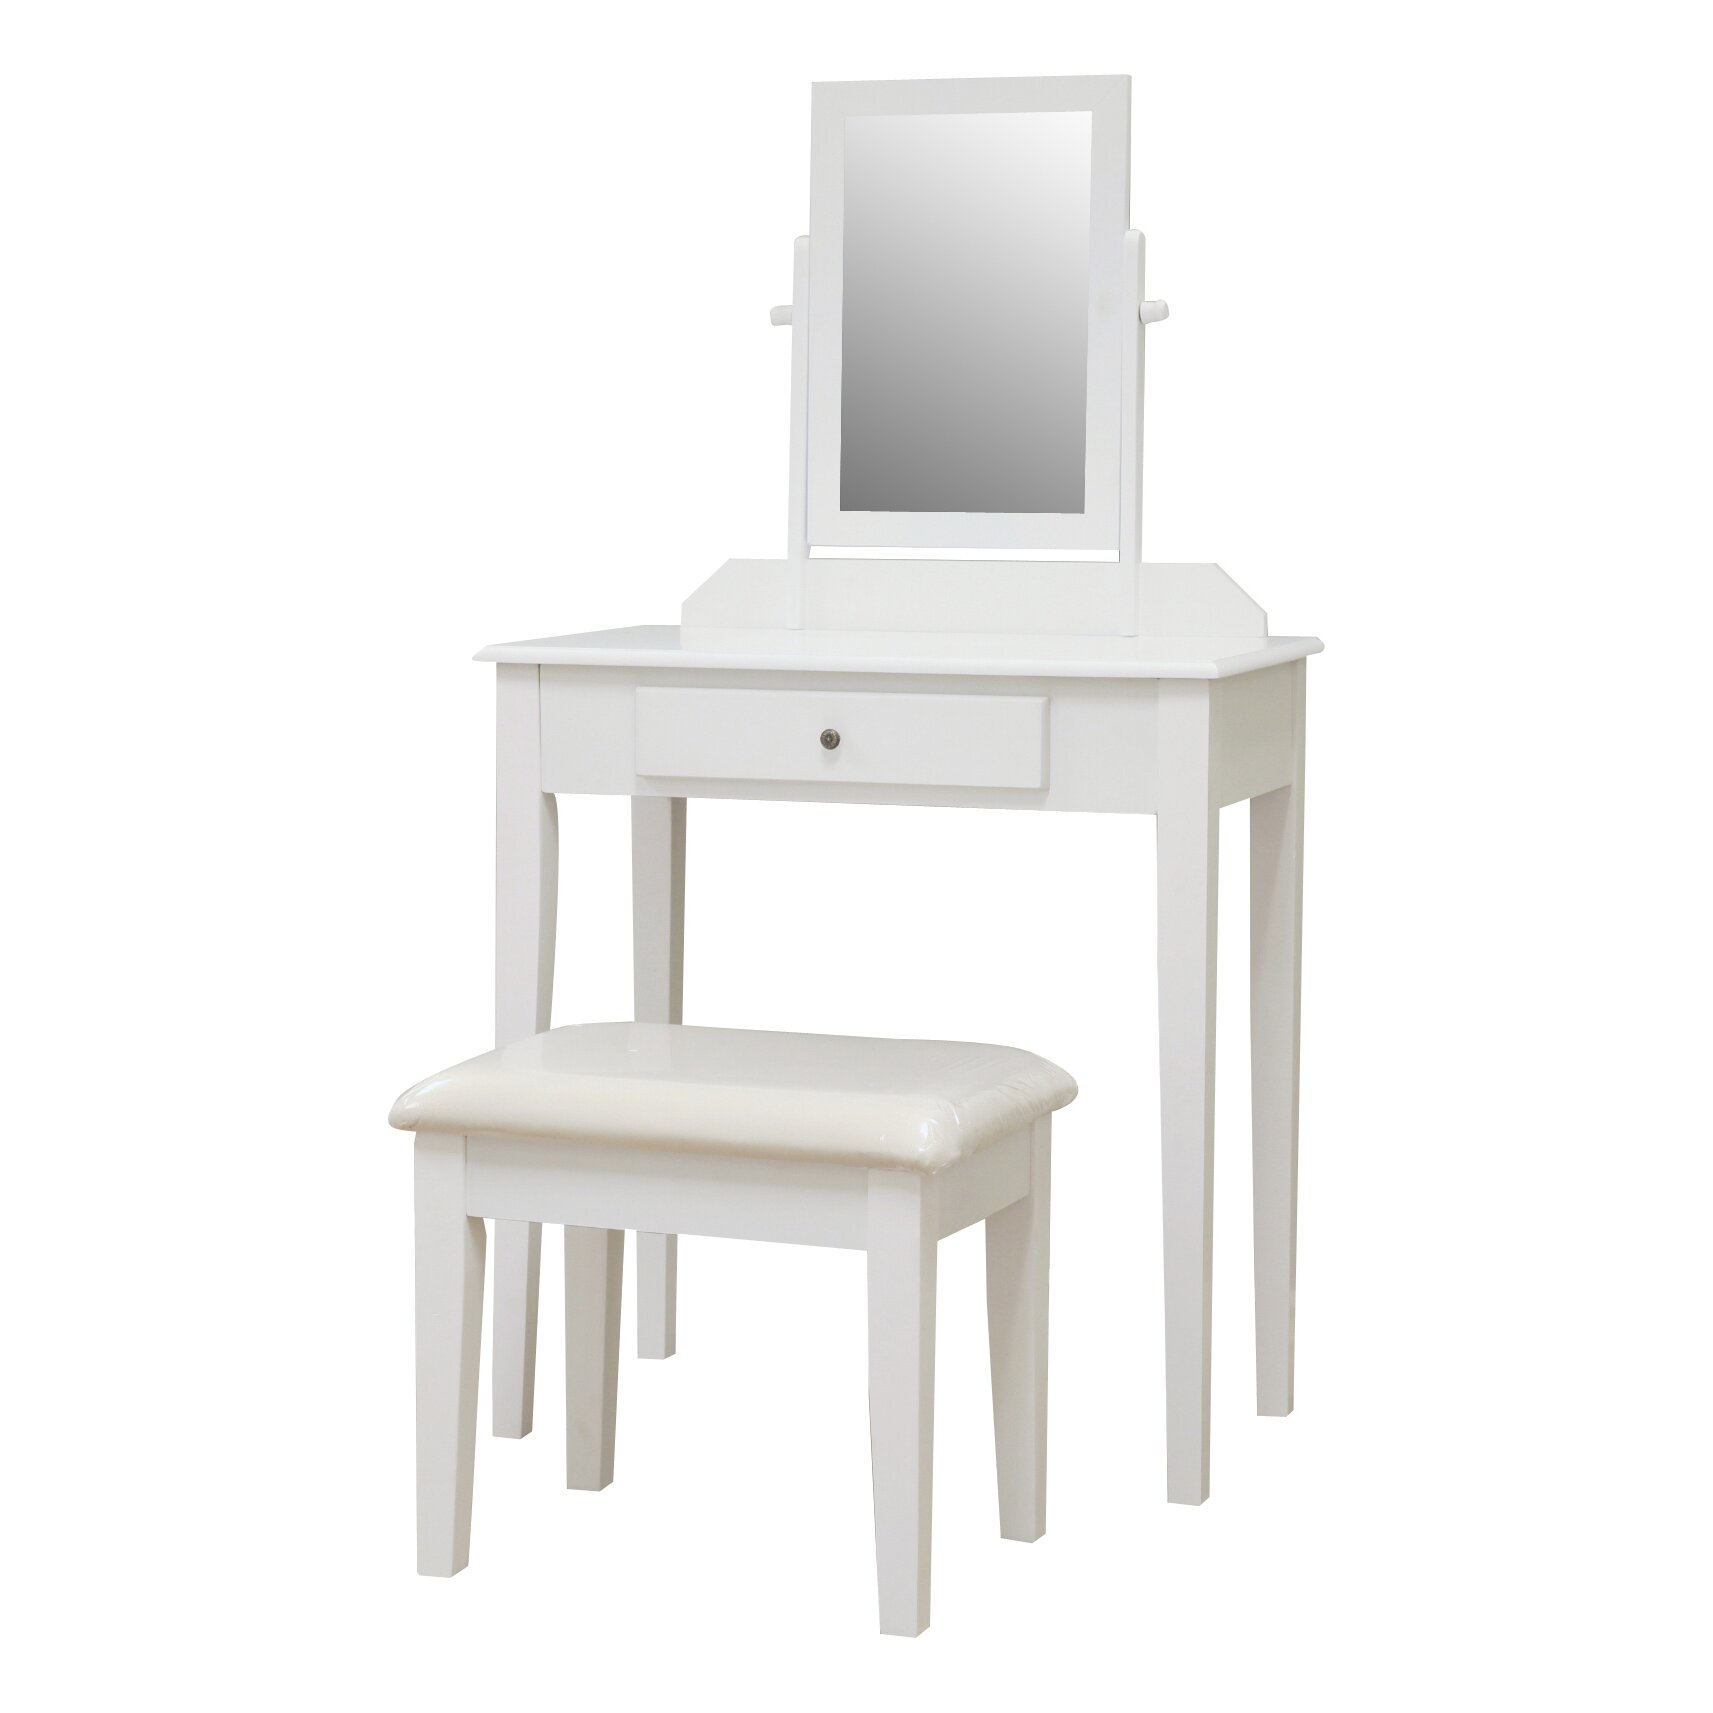 Mega home contemporary vanity set with mirror reviews for Vanity set with mirror